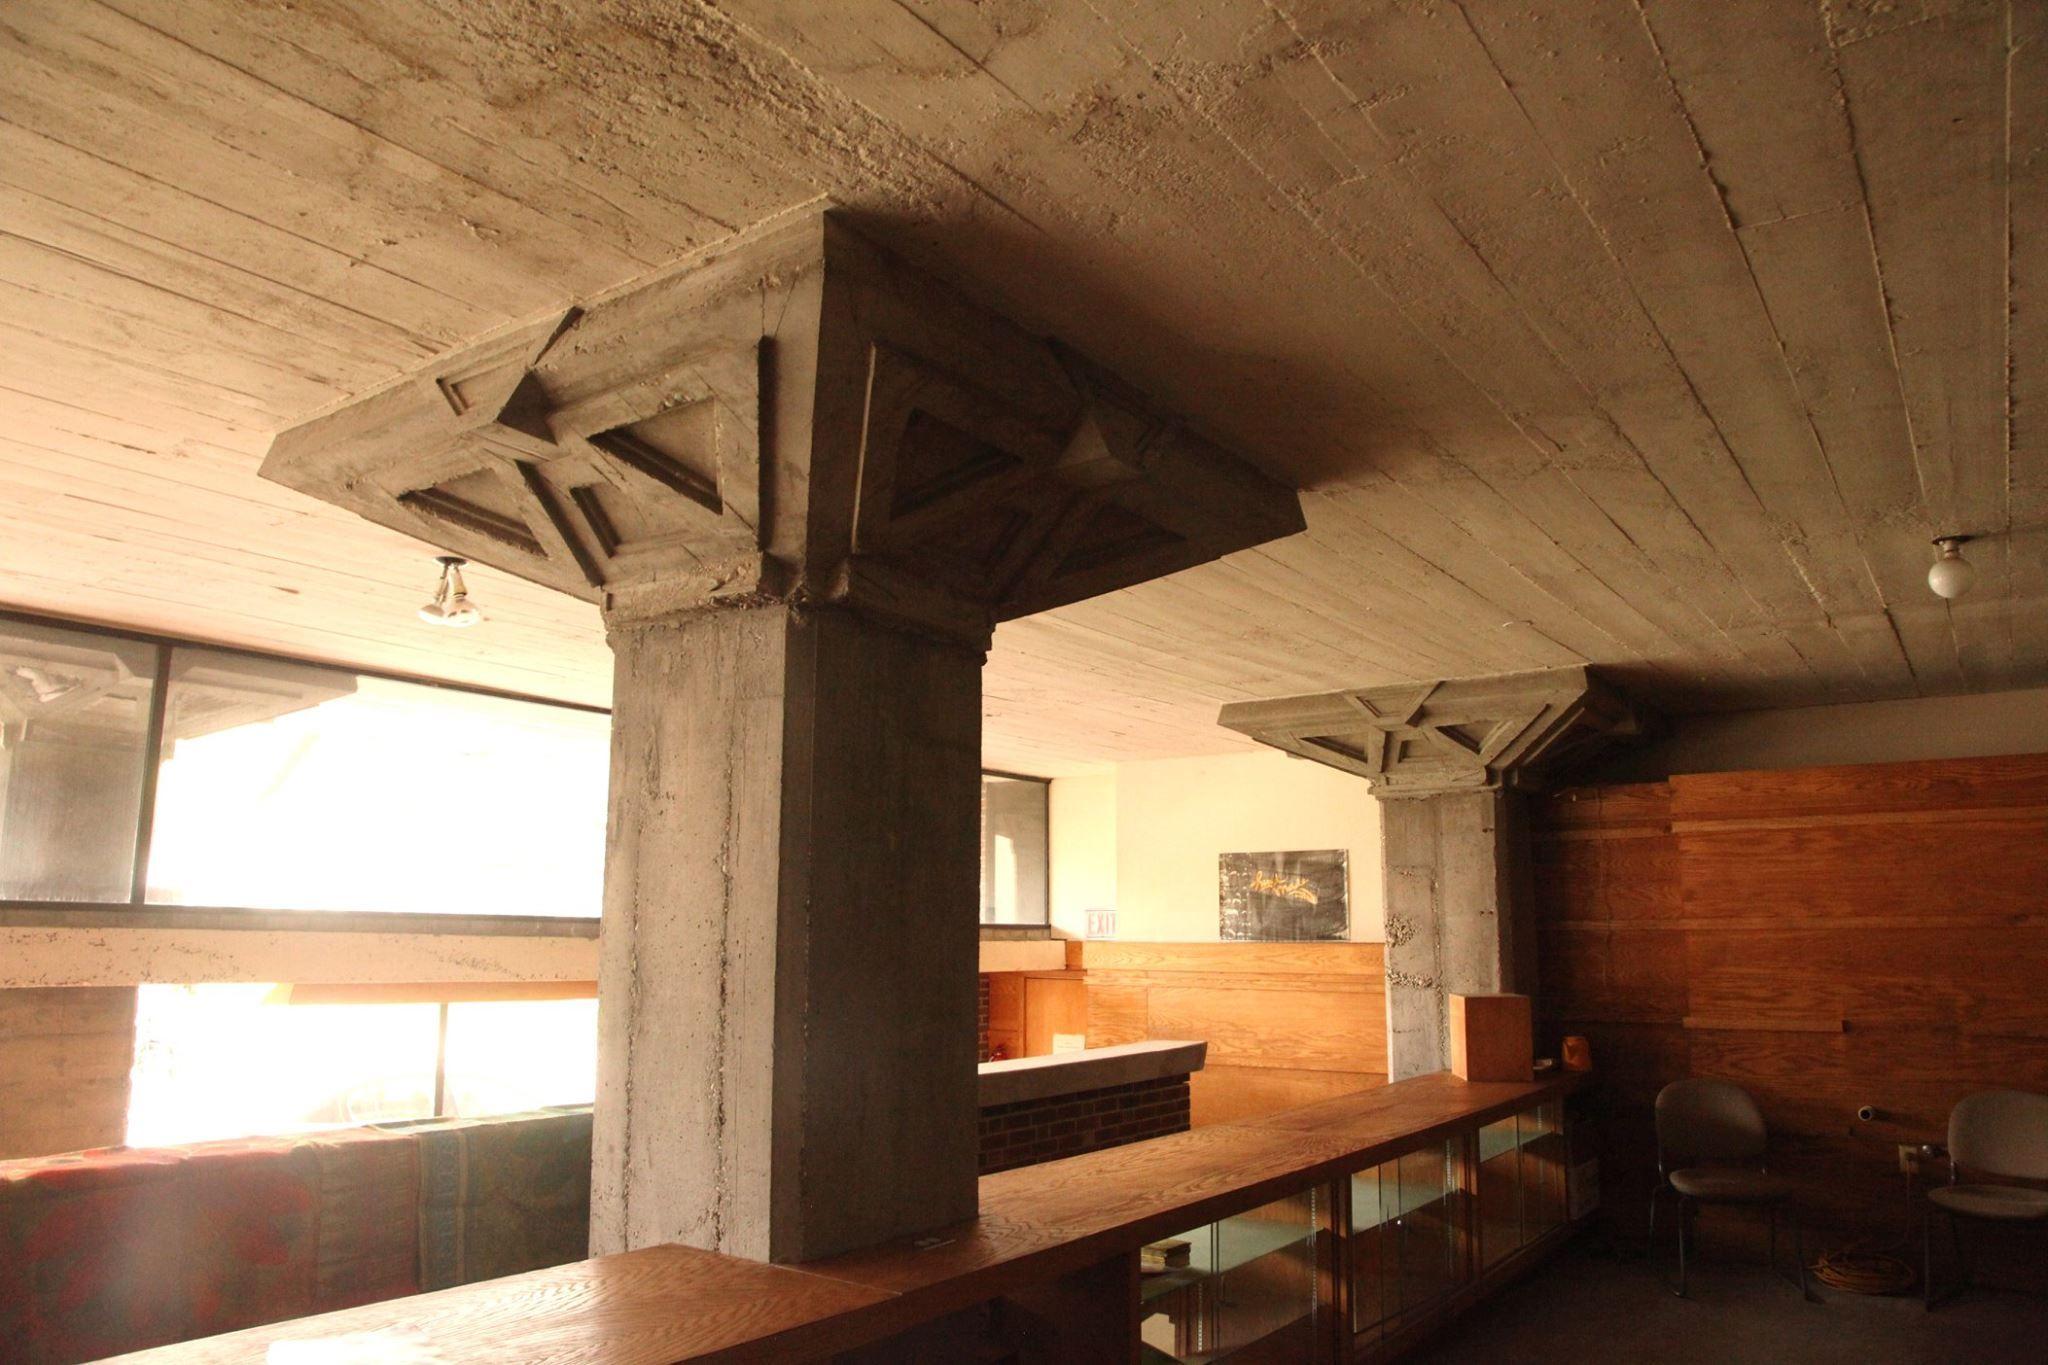 First floor A.D. German Warehouse / 300 South Church